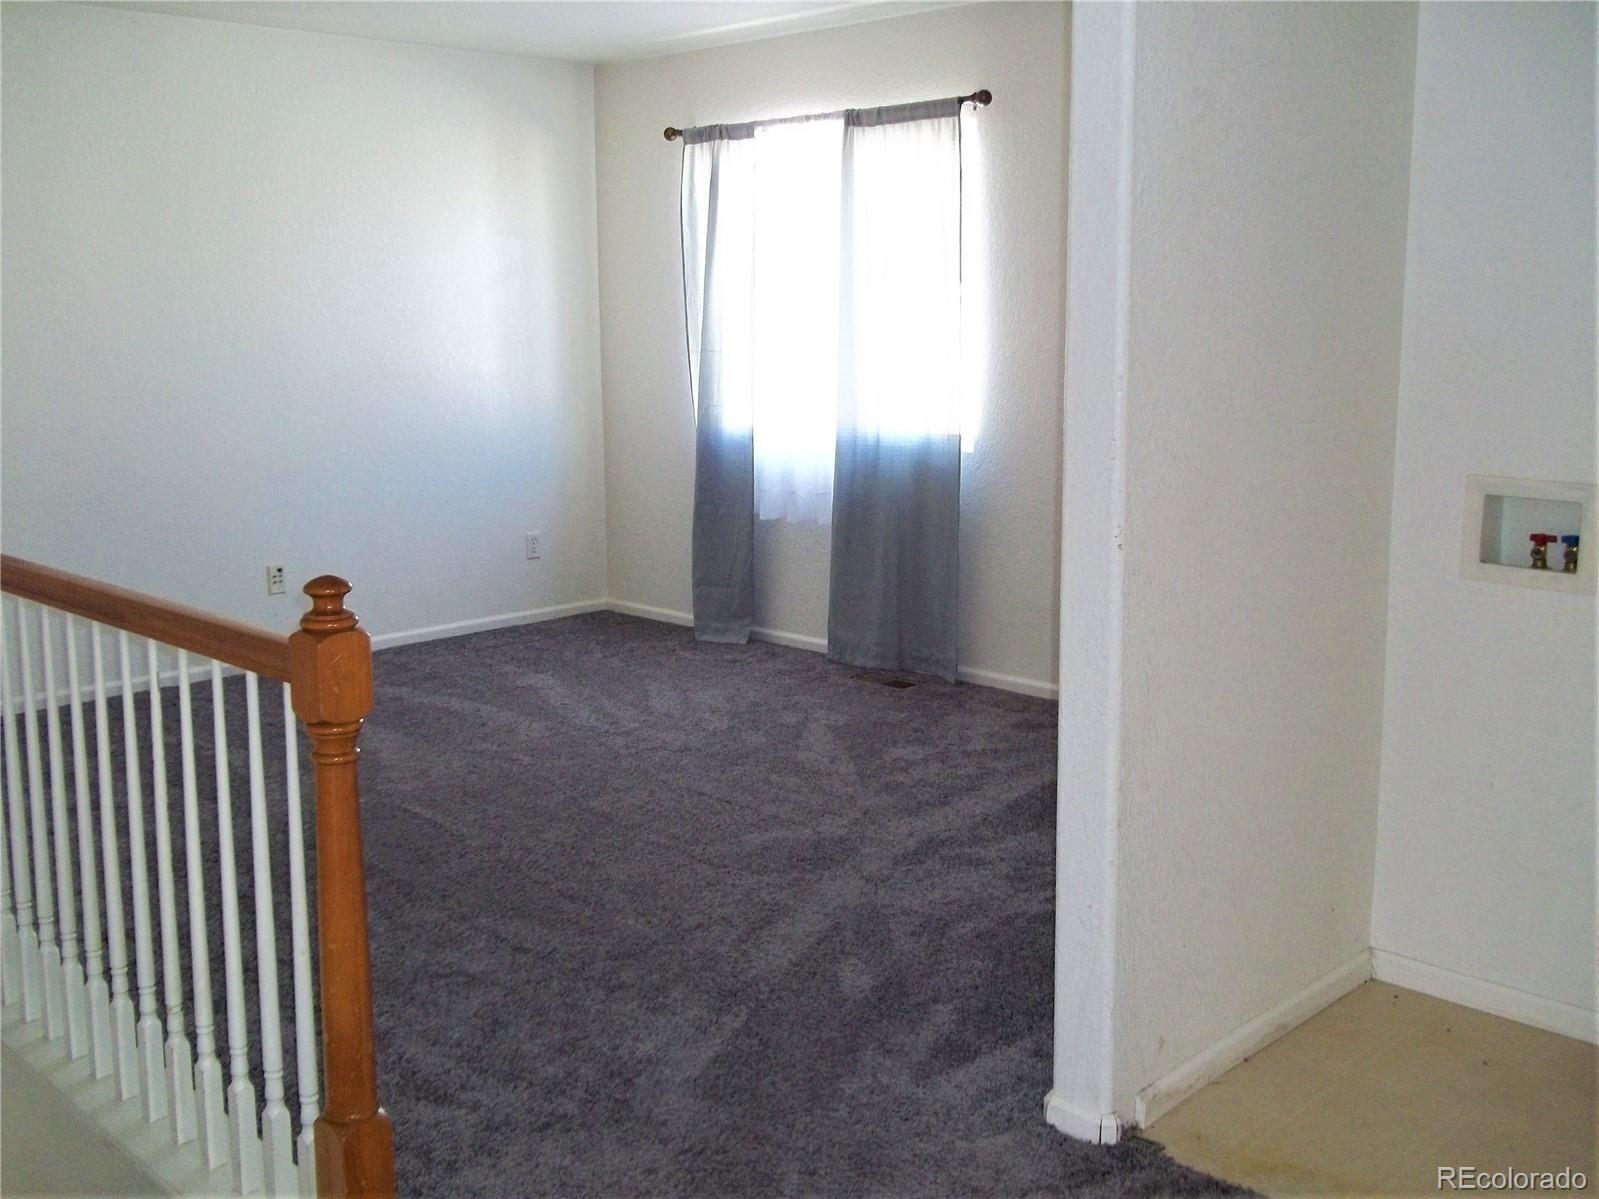 MLS# 7007979 - 1 - 18657  E 40th Place, Denver, CO 80249